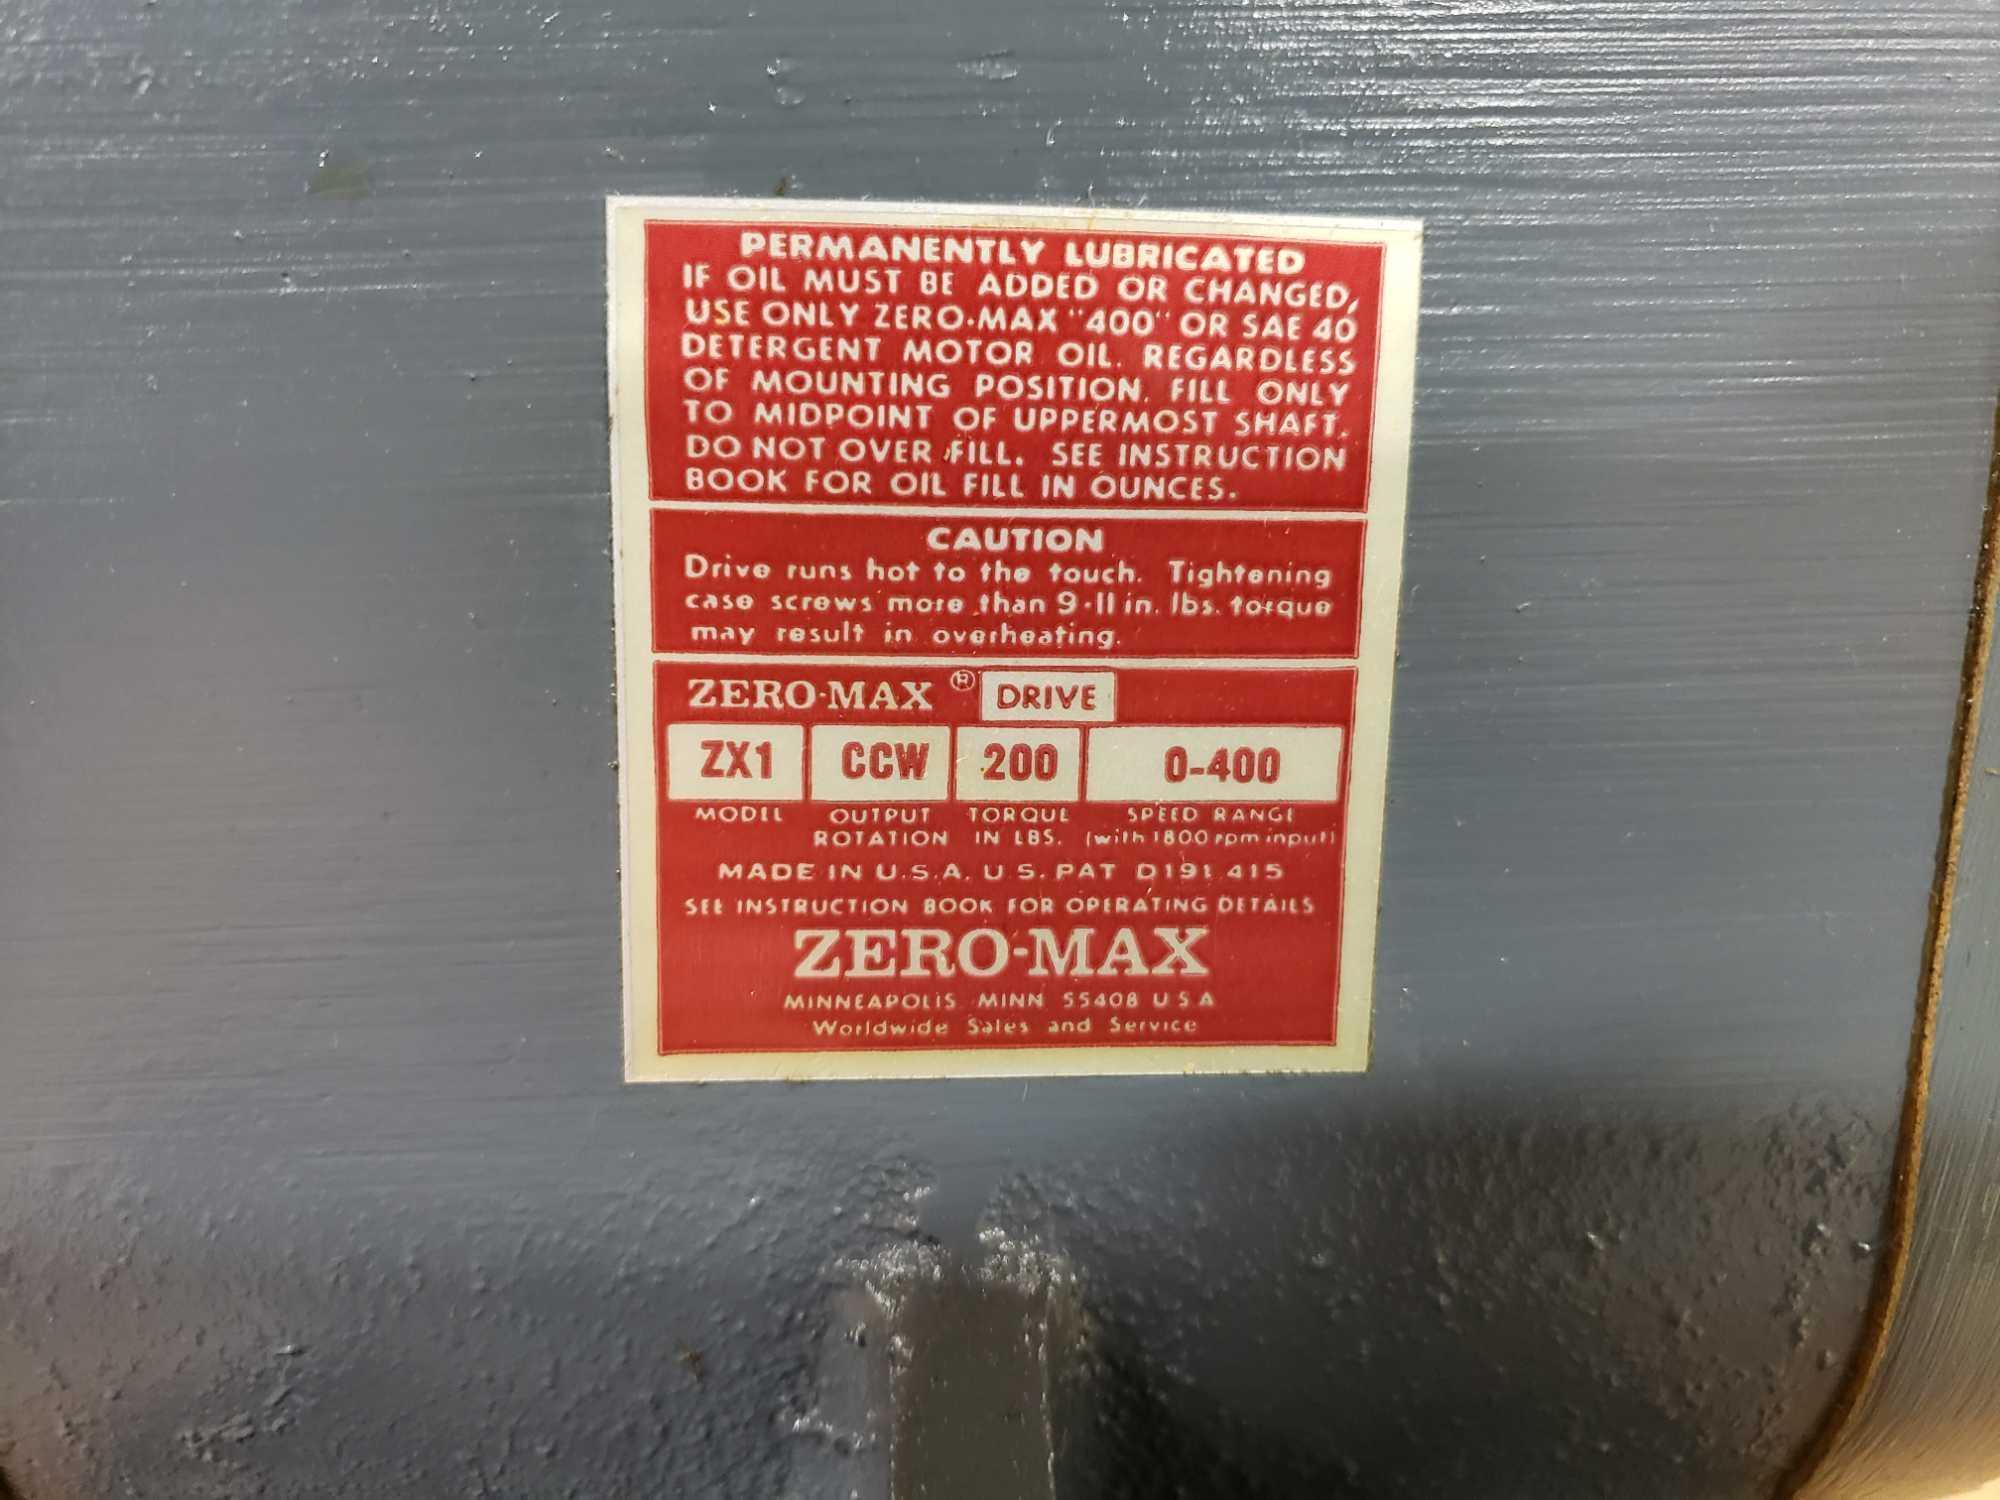 Zero-max drive power block model ZX1, CCW output rotation, 200lb torque, 0-400 speed range. New. - Image 2 of 2